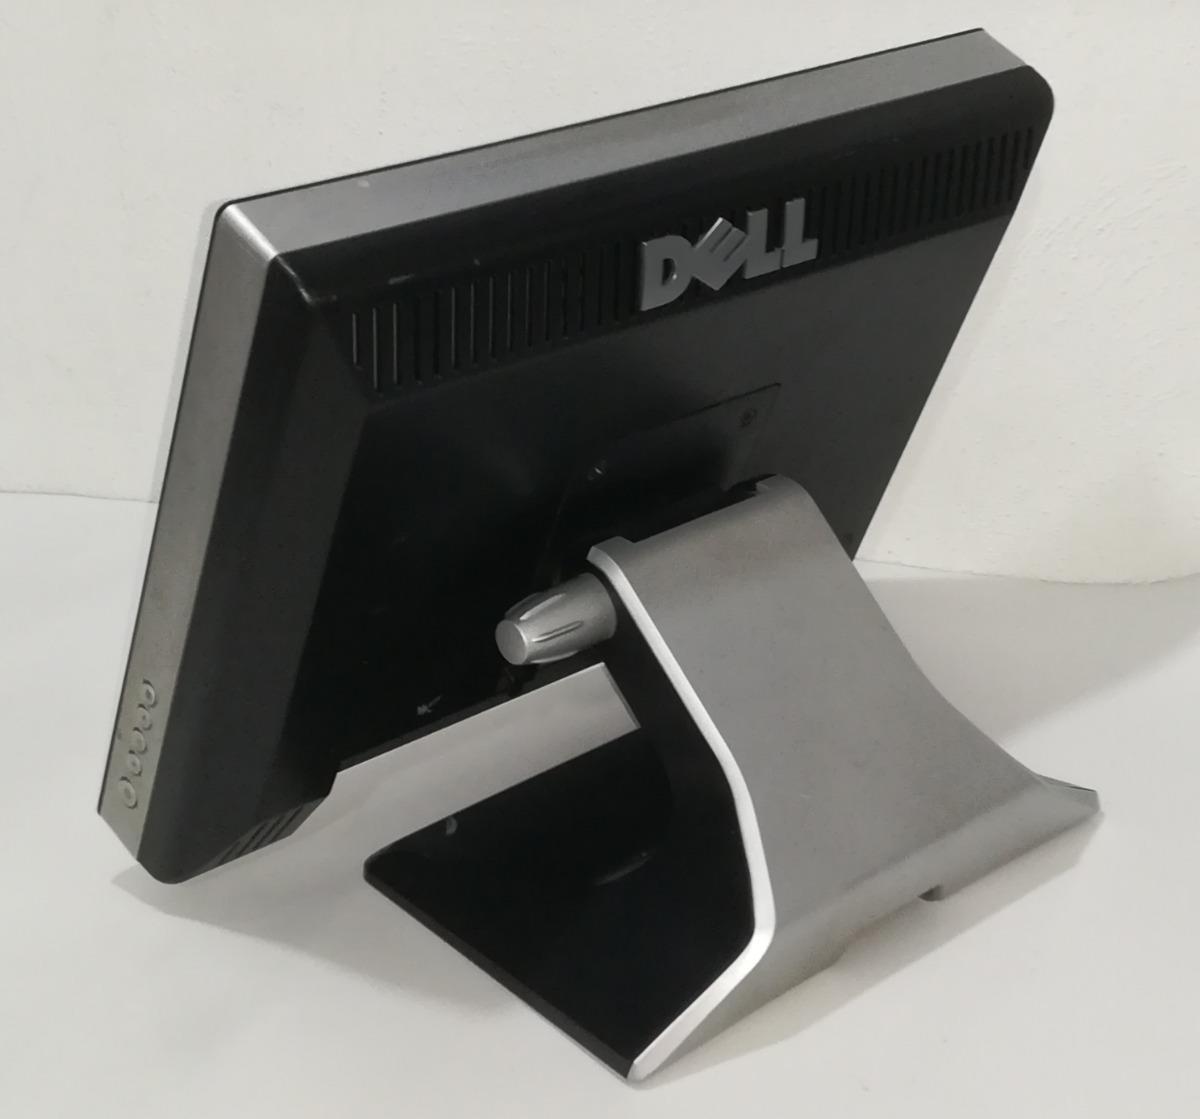 DELL DISPLAYS DELL E157FPT WINDOWS 8.1 DRIVERS DOWNLOAD